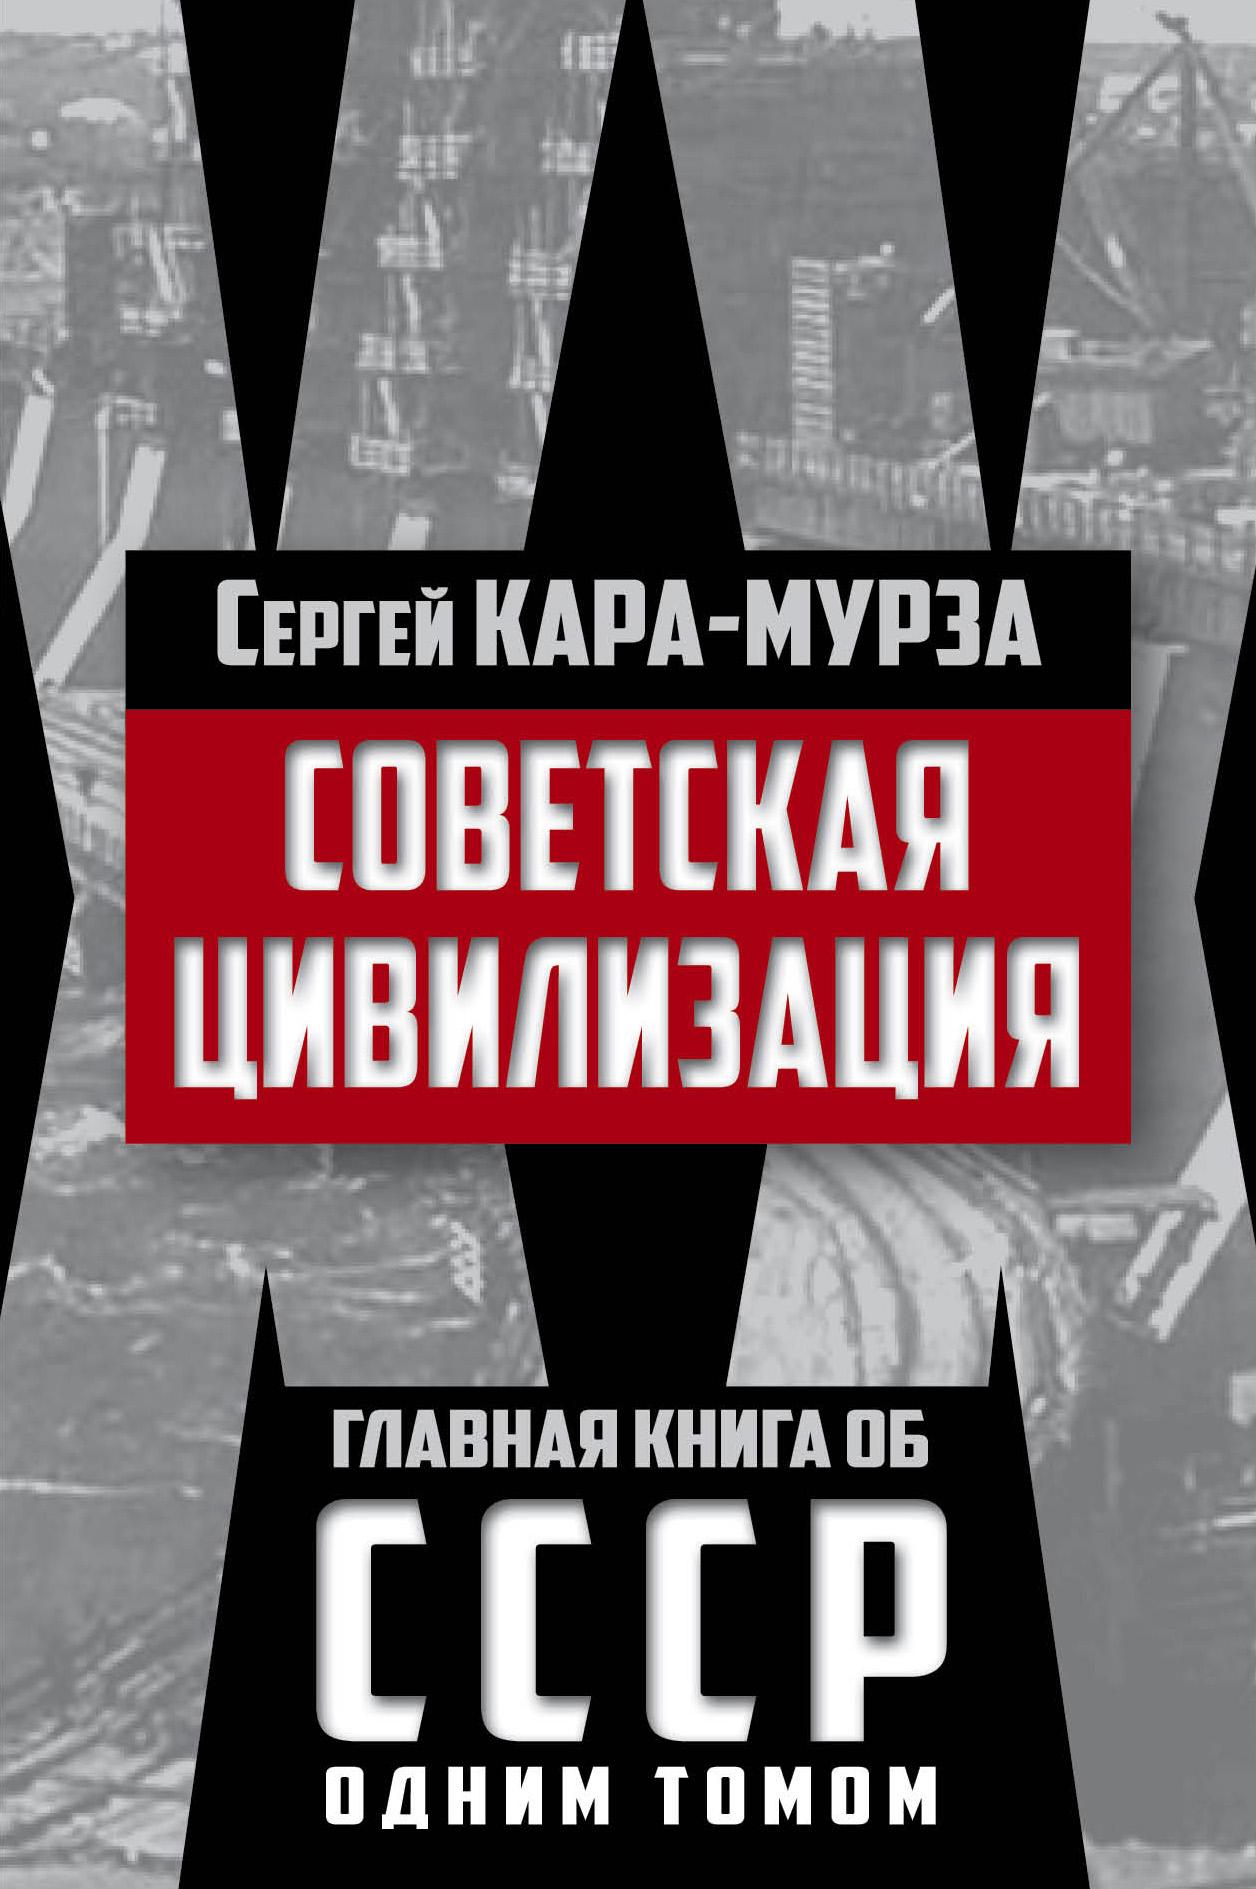 sovetskaya tsivilizatsiya